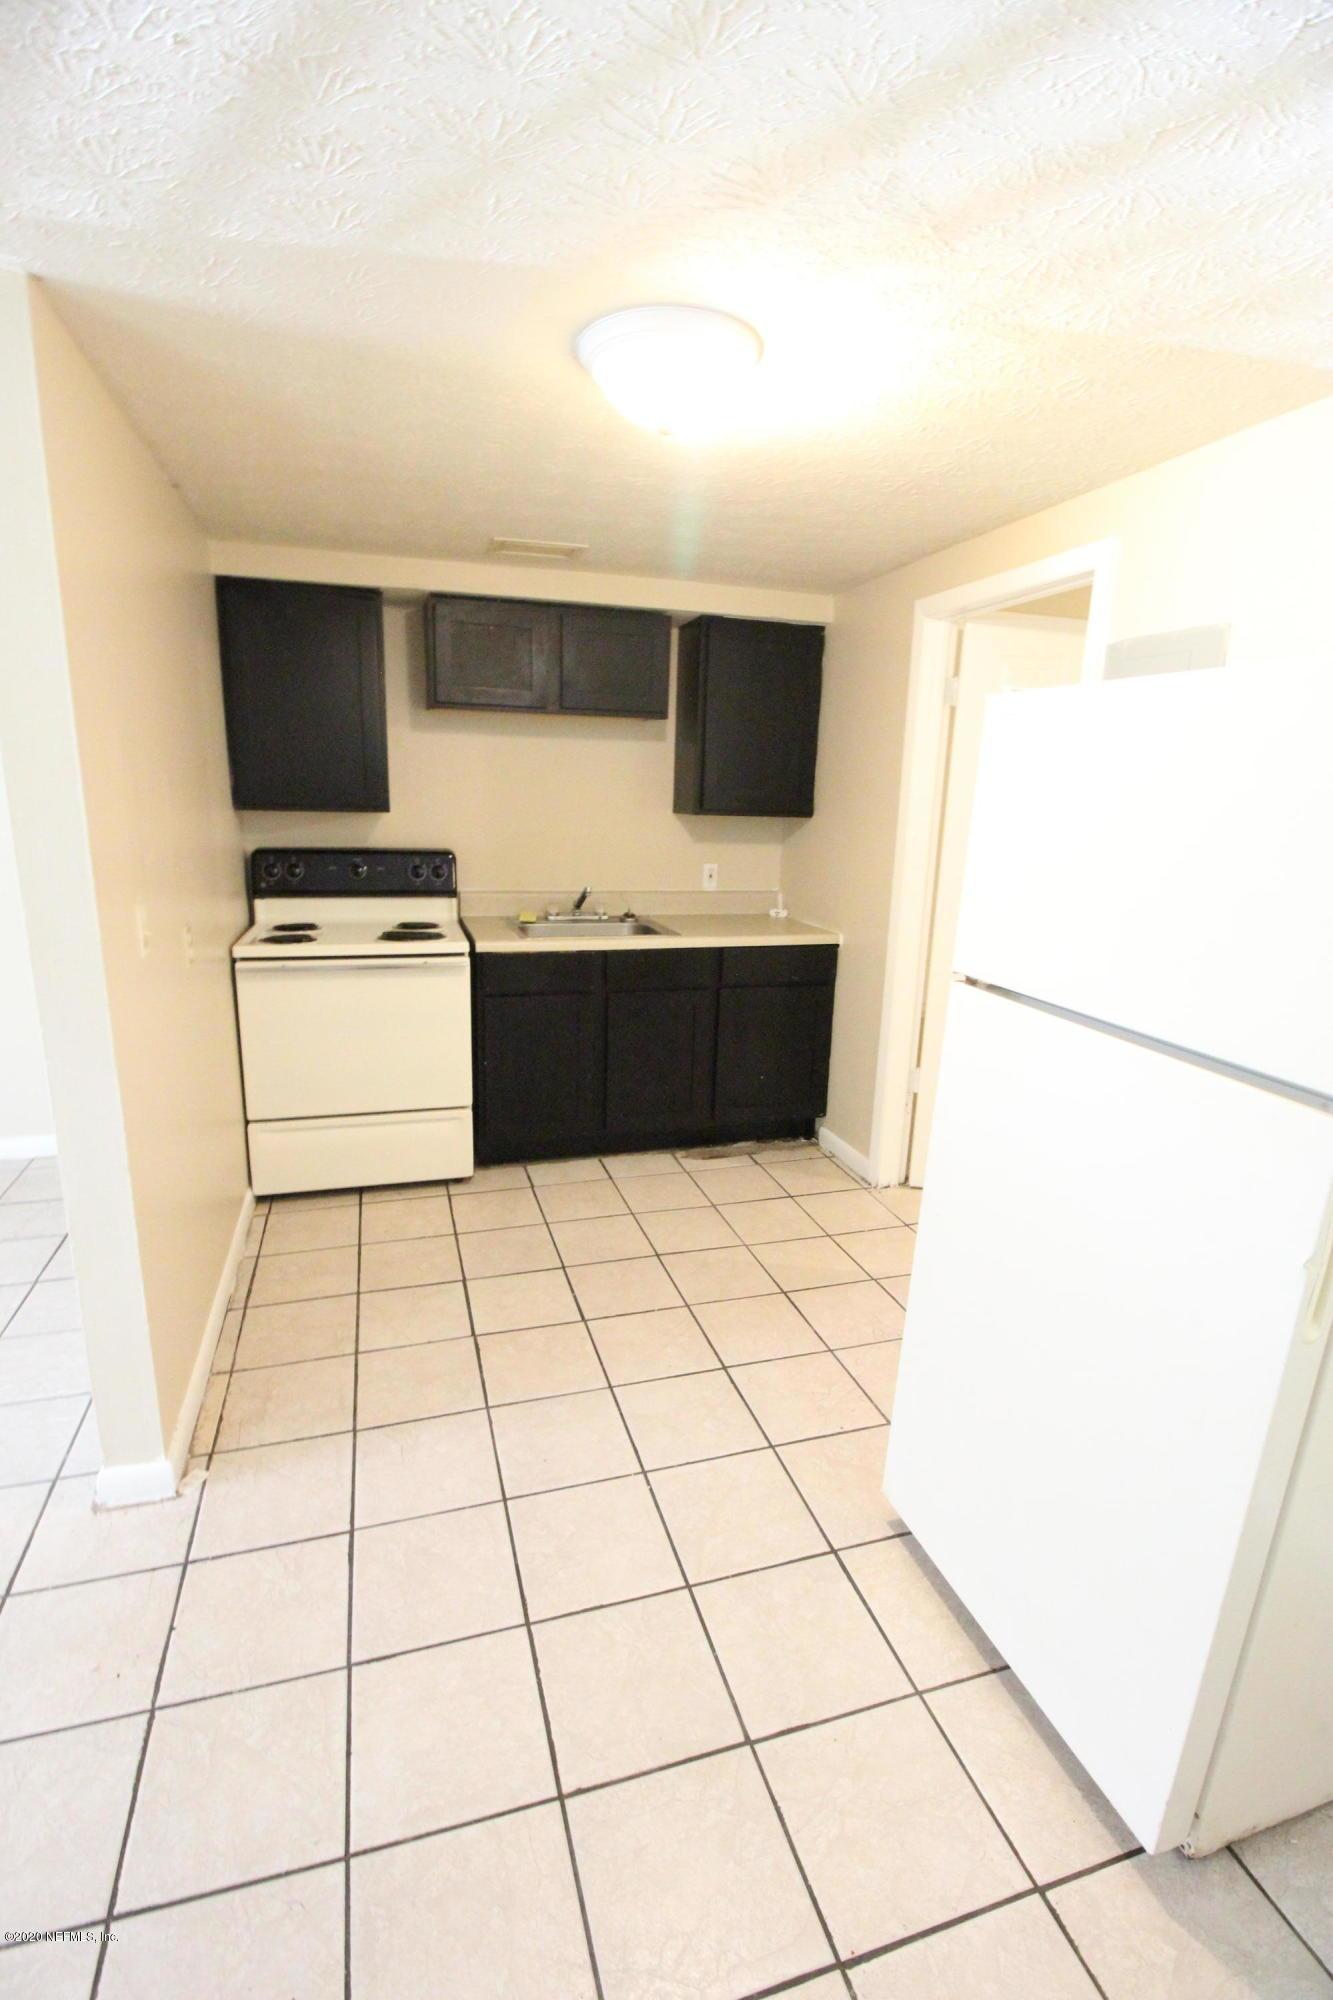 2865 6TH, JACKSONVILLE, FLORIDA 32254, 1 Bedroom Bedrooms, ,1 BathroomBathrooms,Rental,For Rent,6TH,1080215